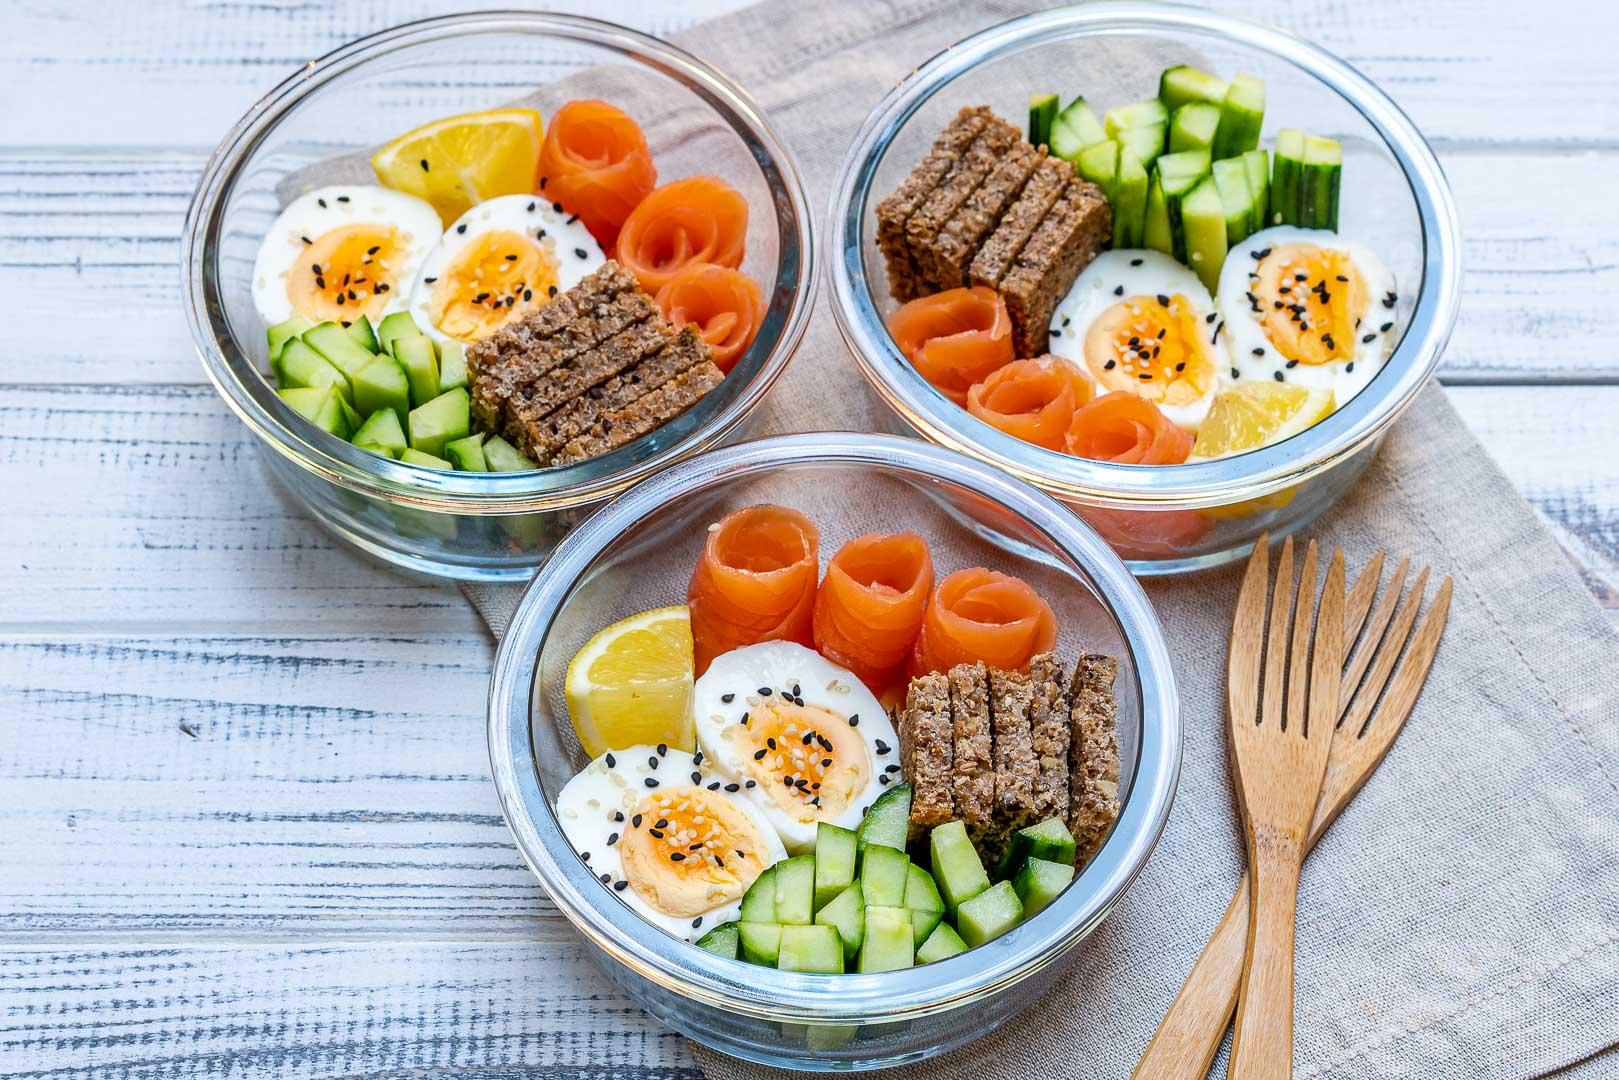 Healthy Smoked Salmon Protein Packed Bento Boxes